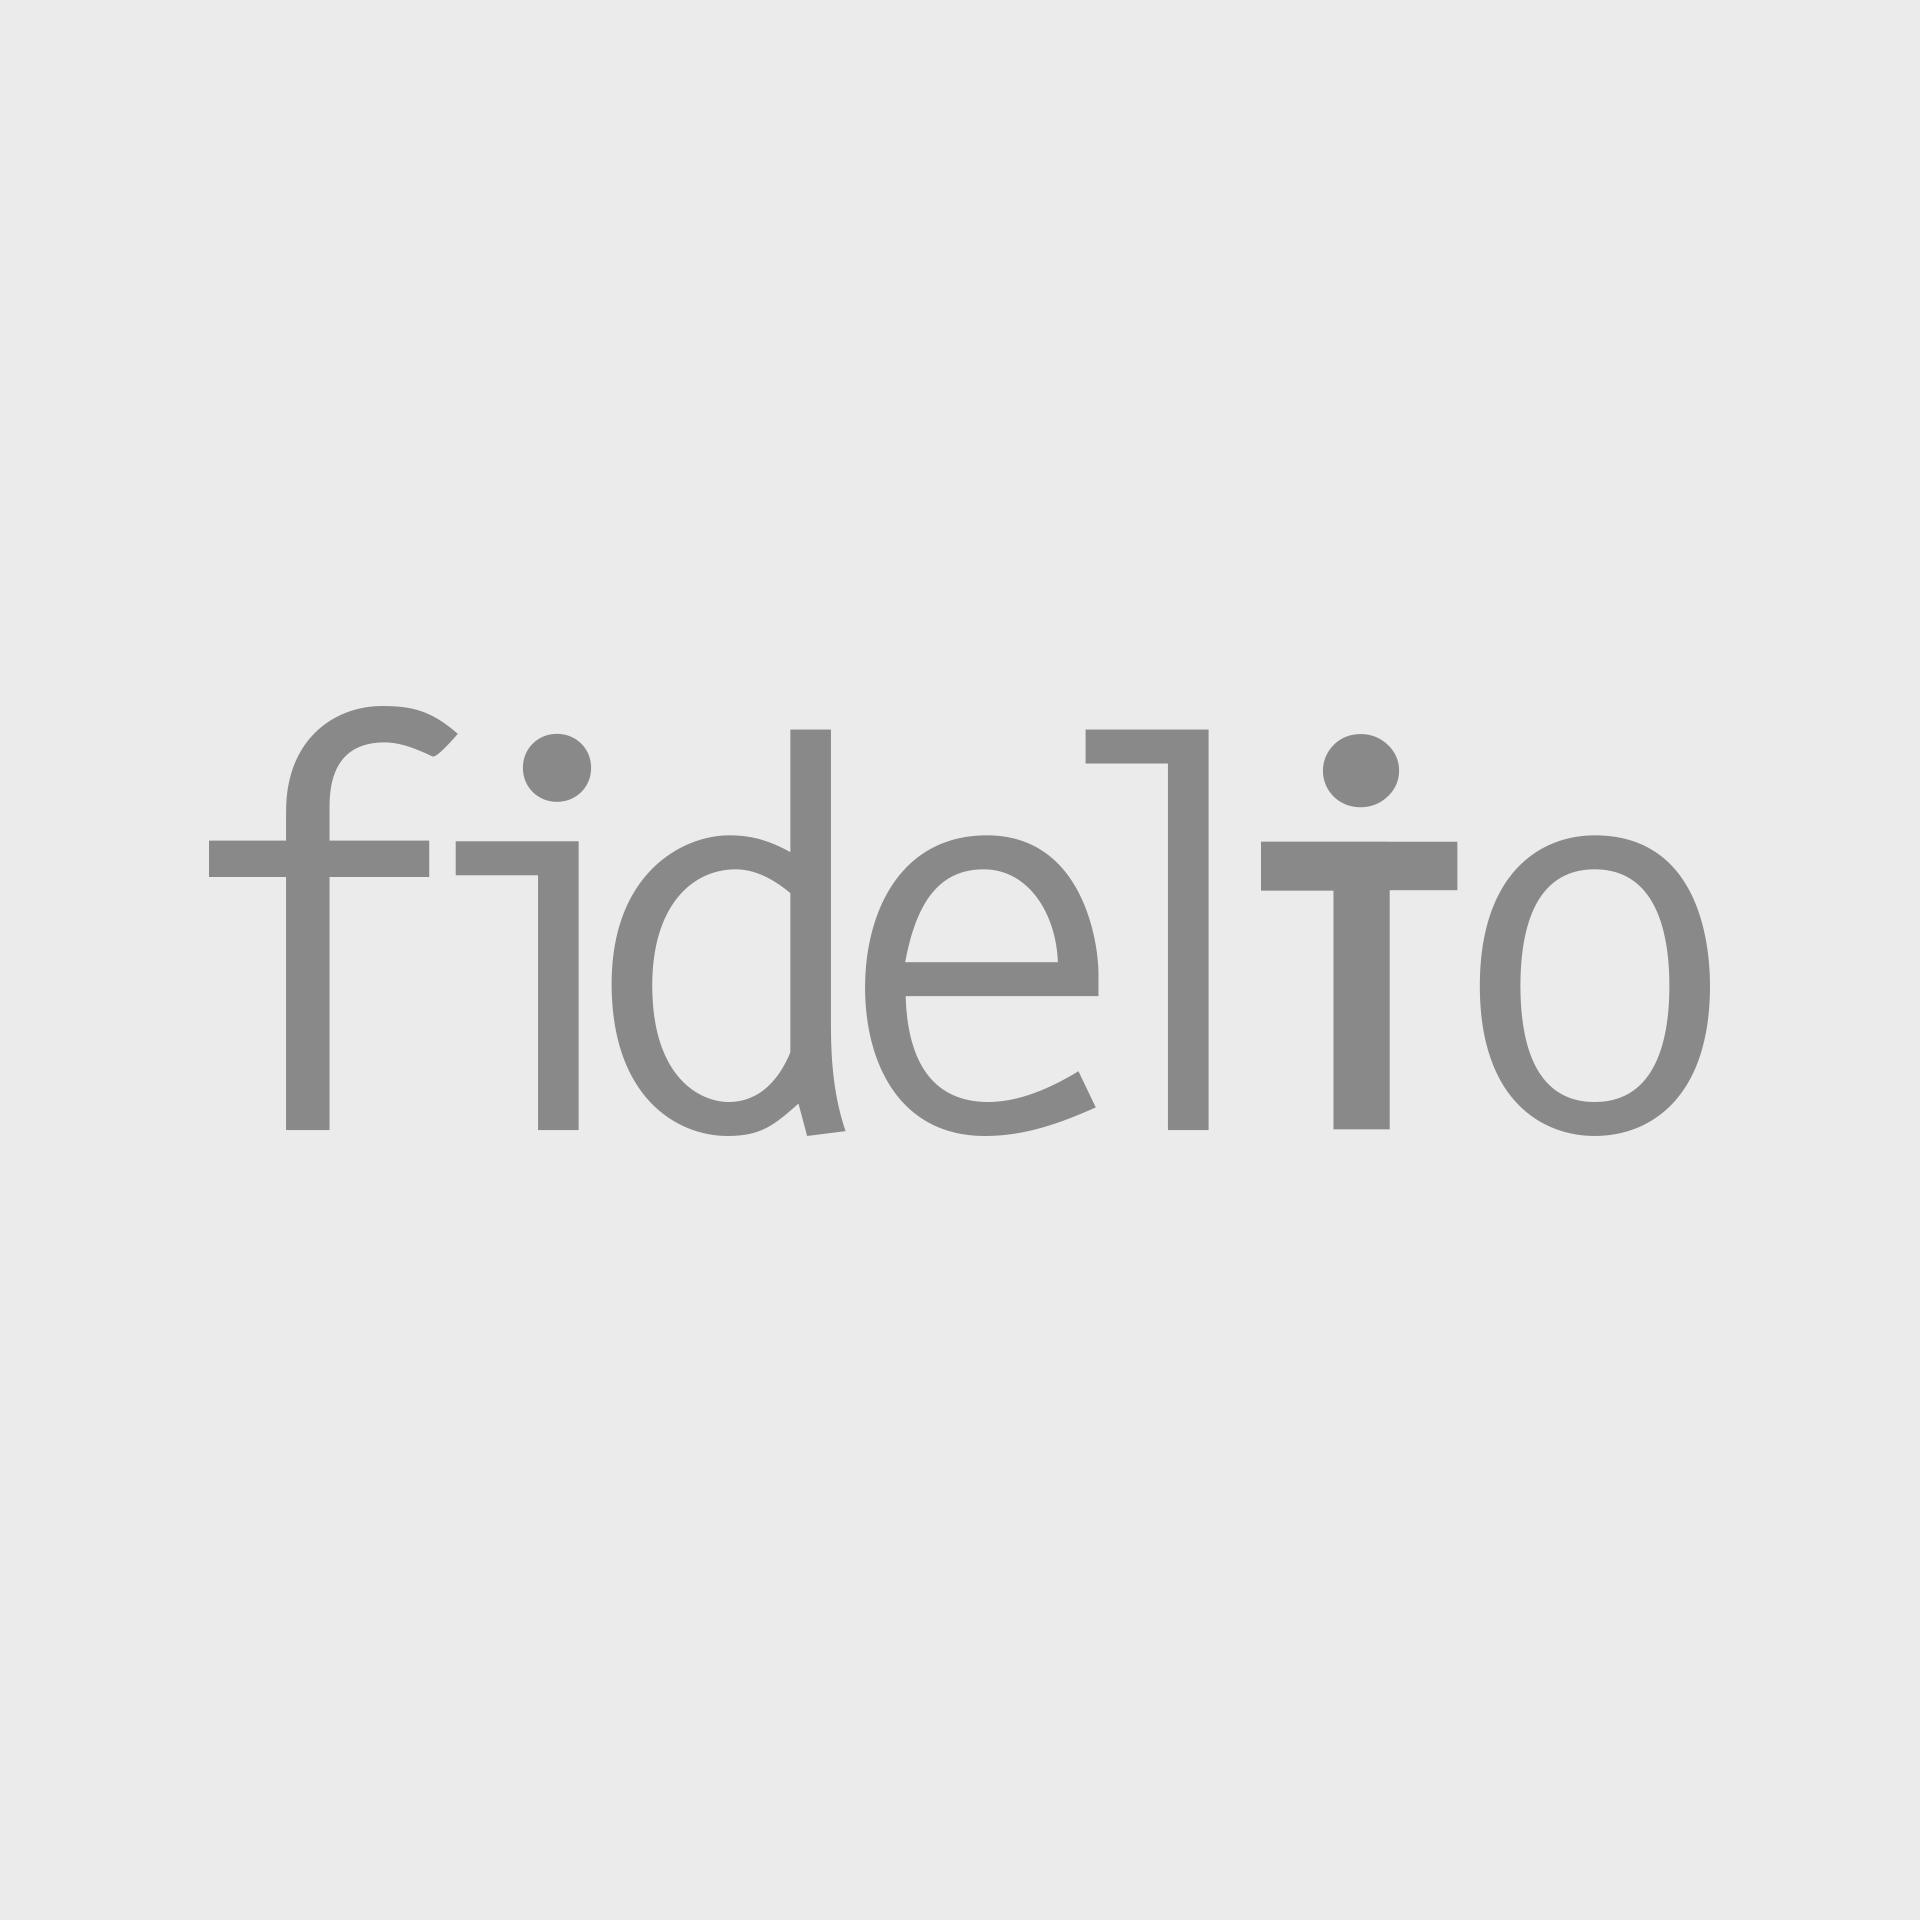 Aukcio_meghivo_2018-121303.jpg